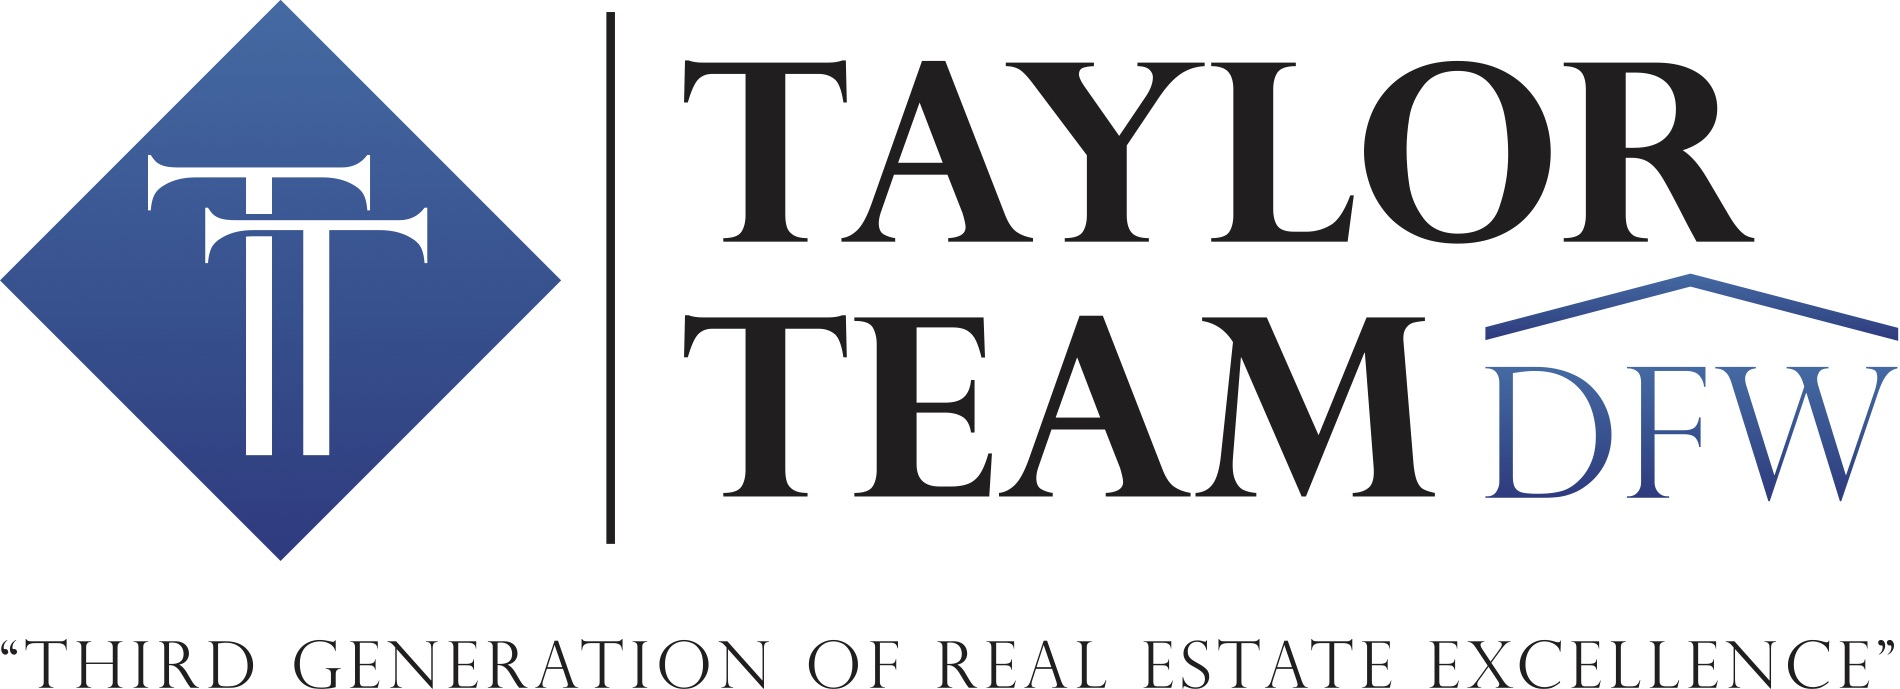 Taylor Team DFW reviews | Real Estate Agents at 3600 Preston Road - Plano TX